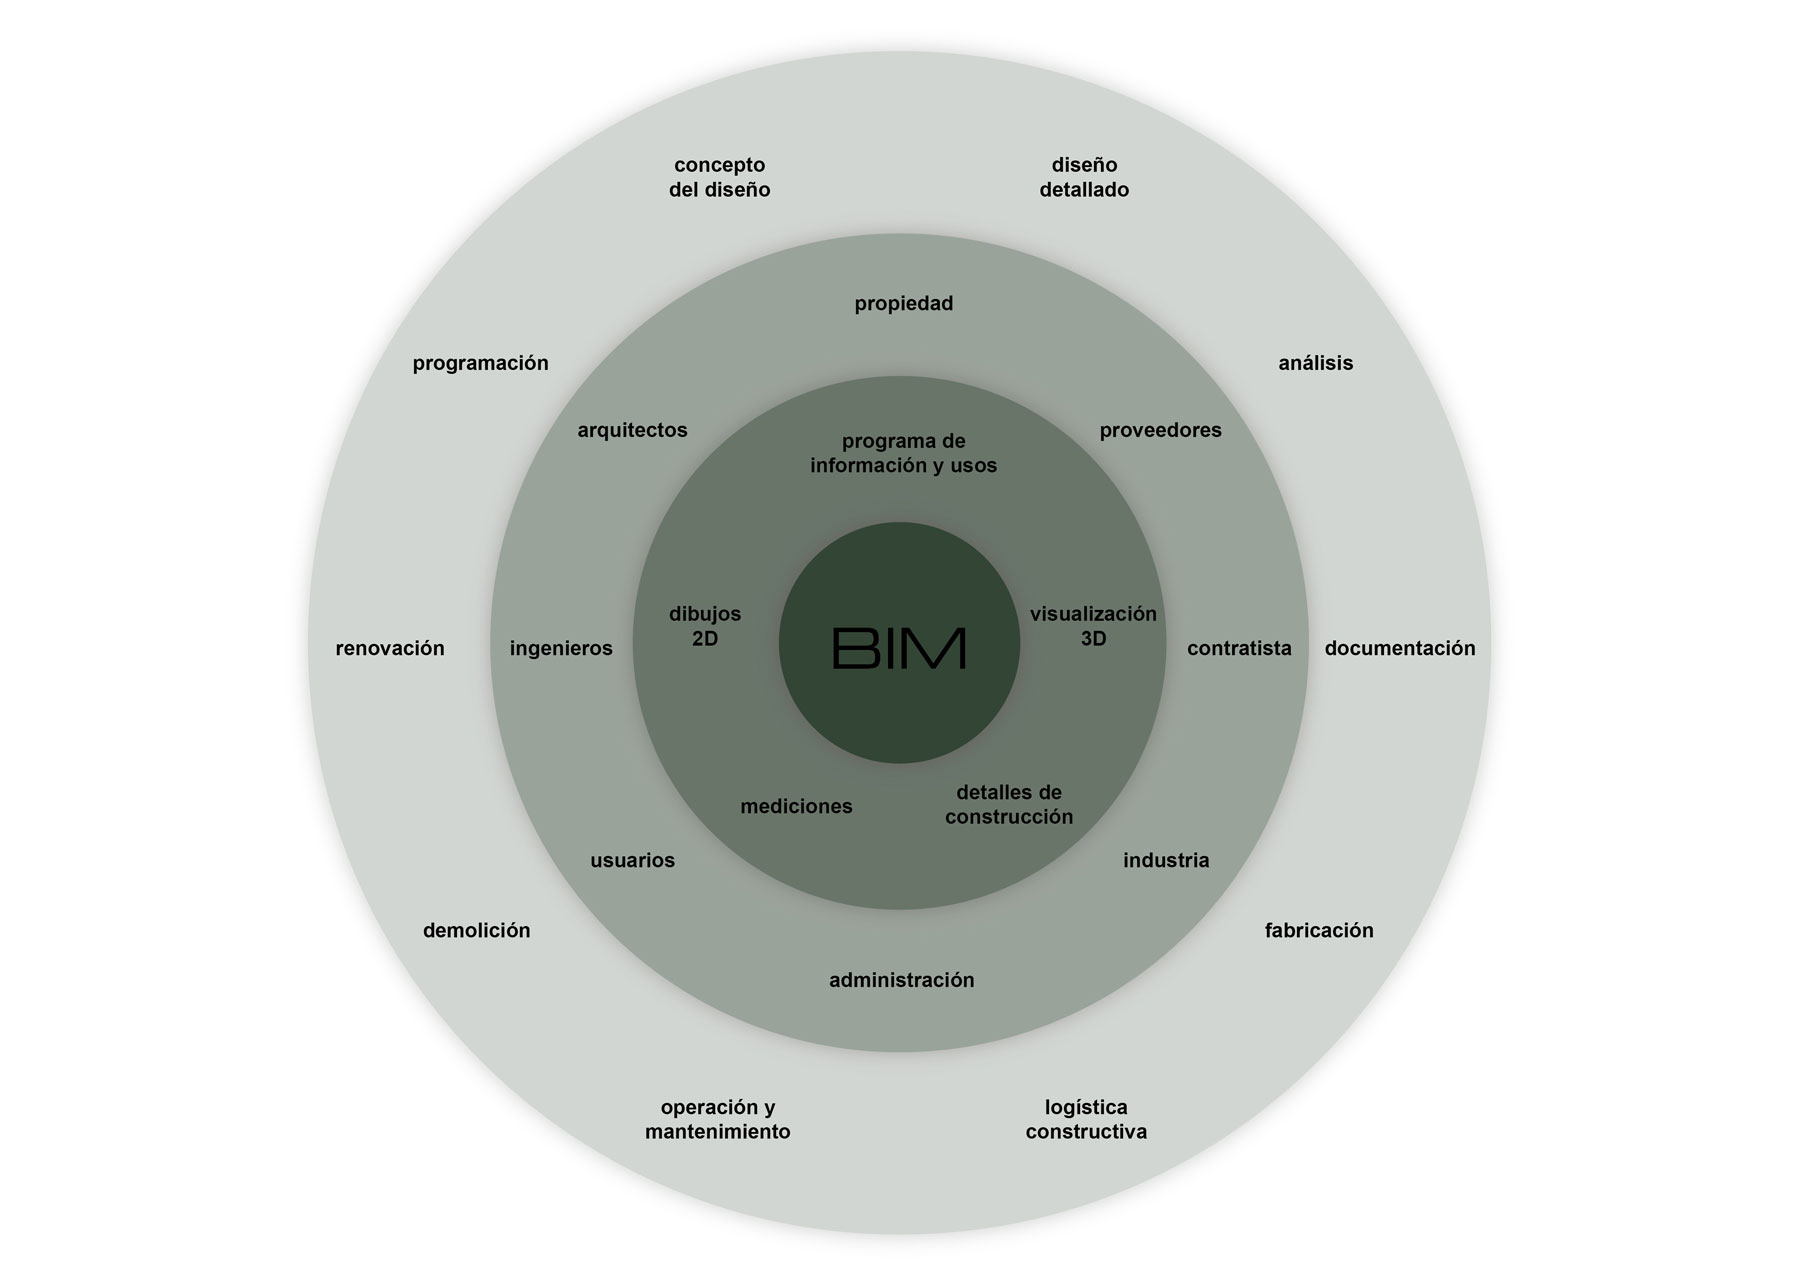 diagrama-tecnología-bim